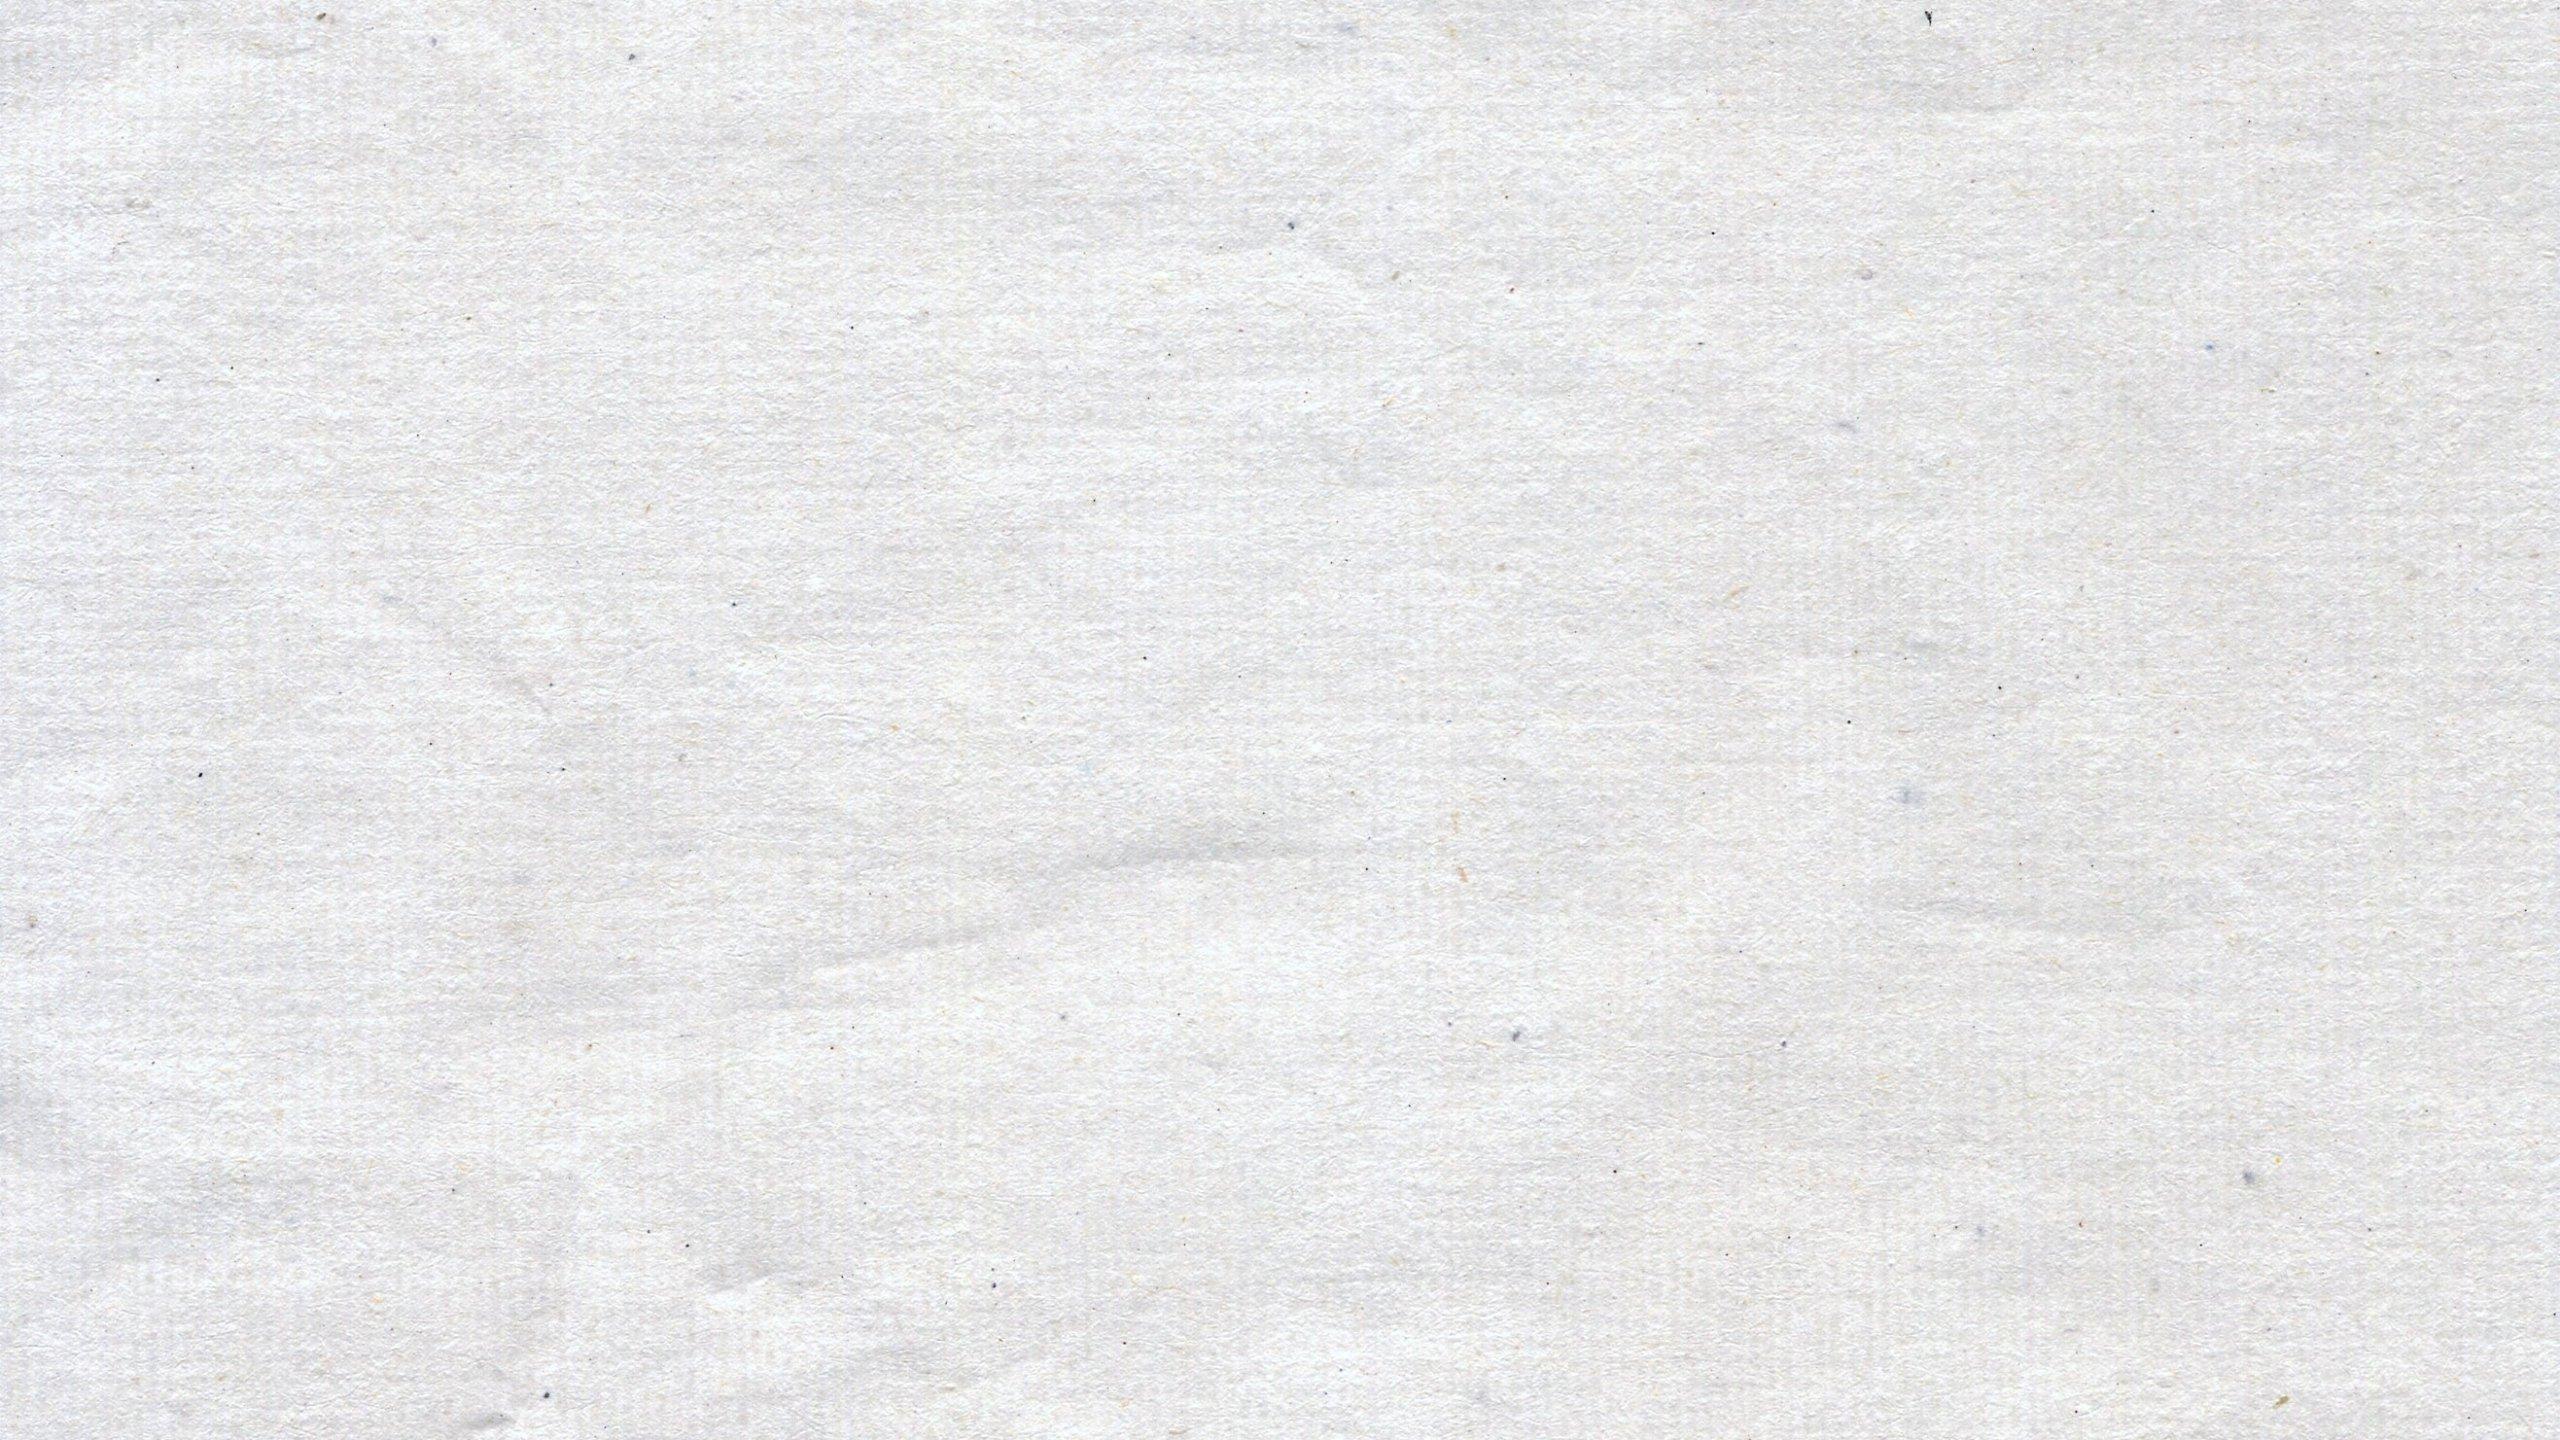 cool white wallpapers wallpapersafari. Black Bedroom Furniture Sets. Home Design Ideas